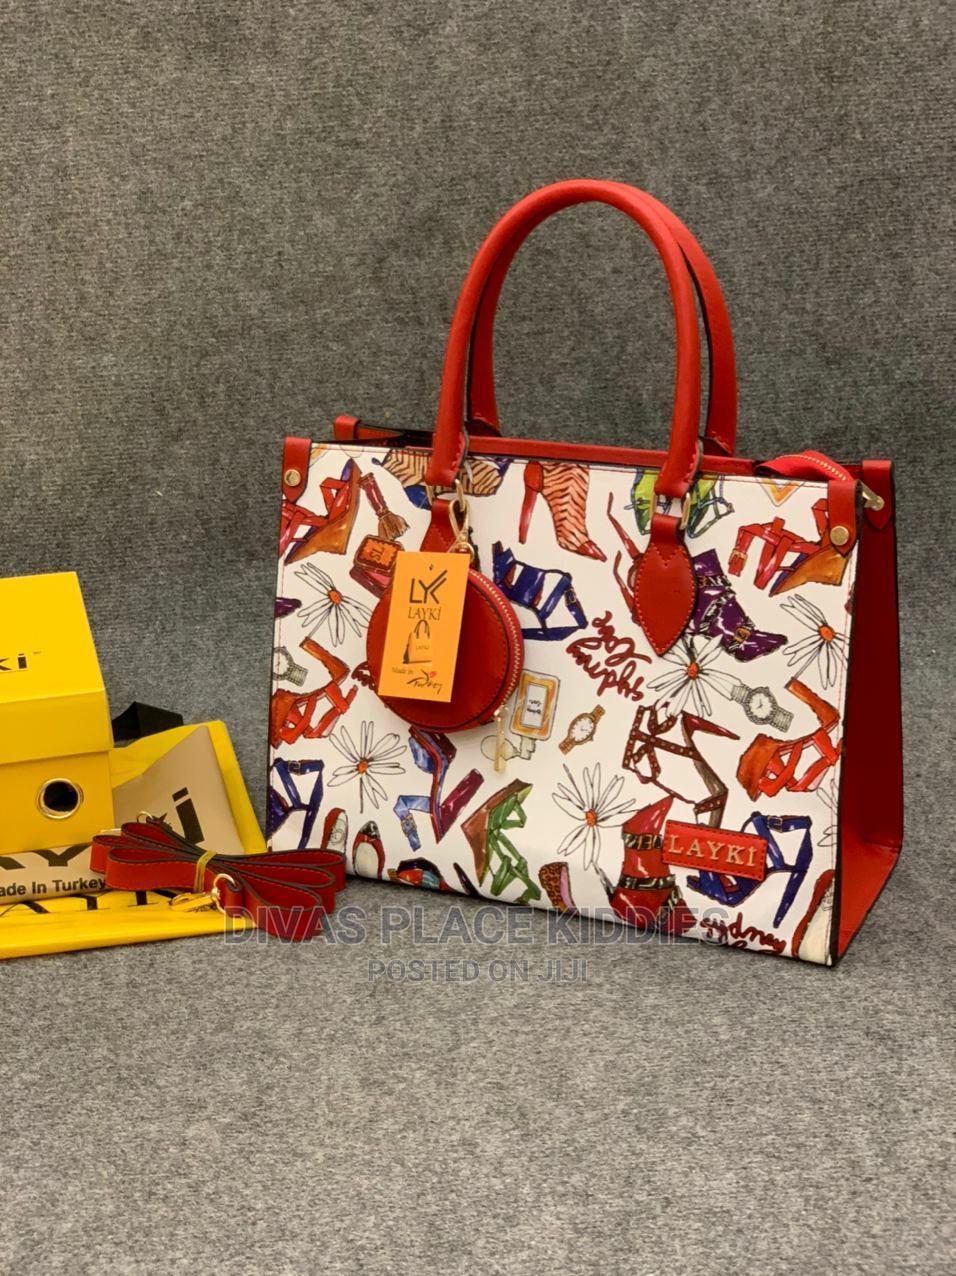 Quality Turkish Bags